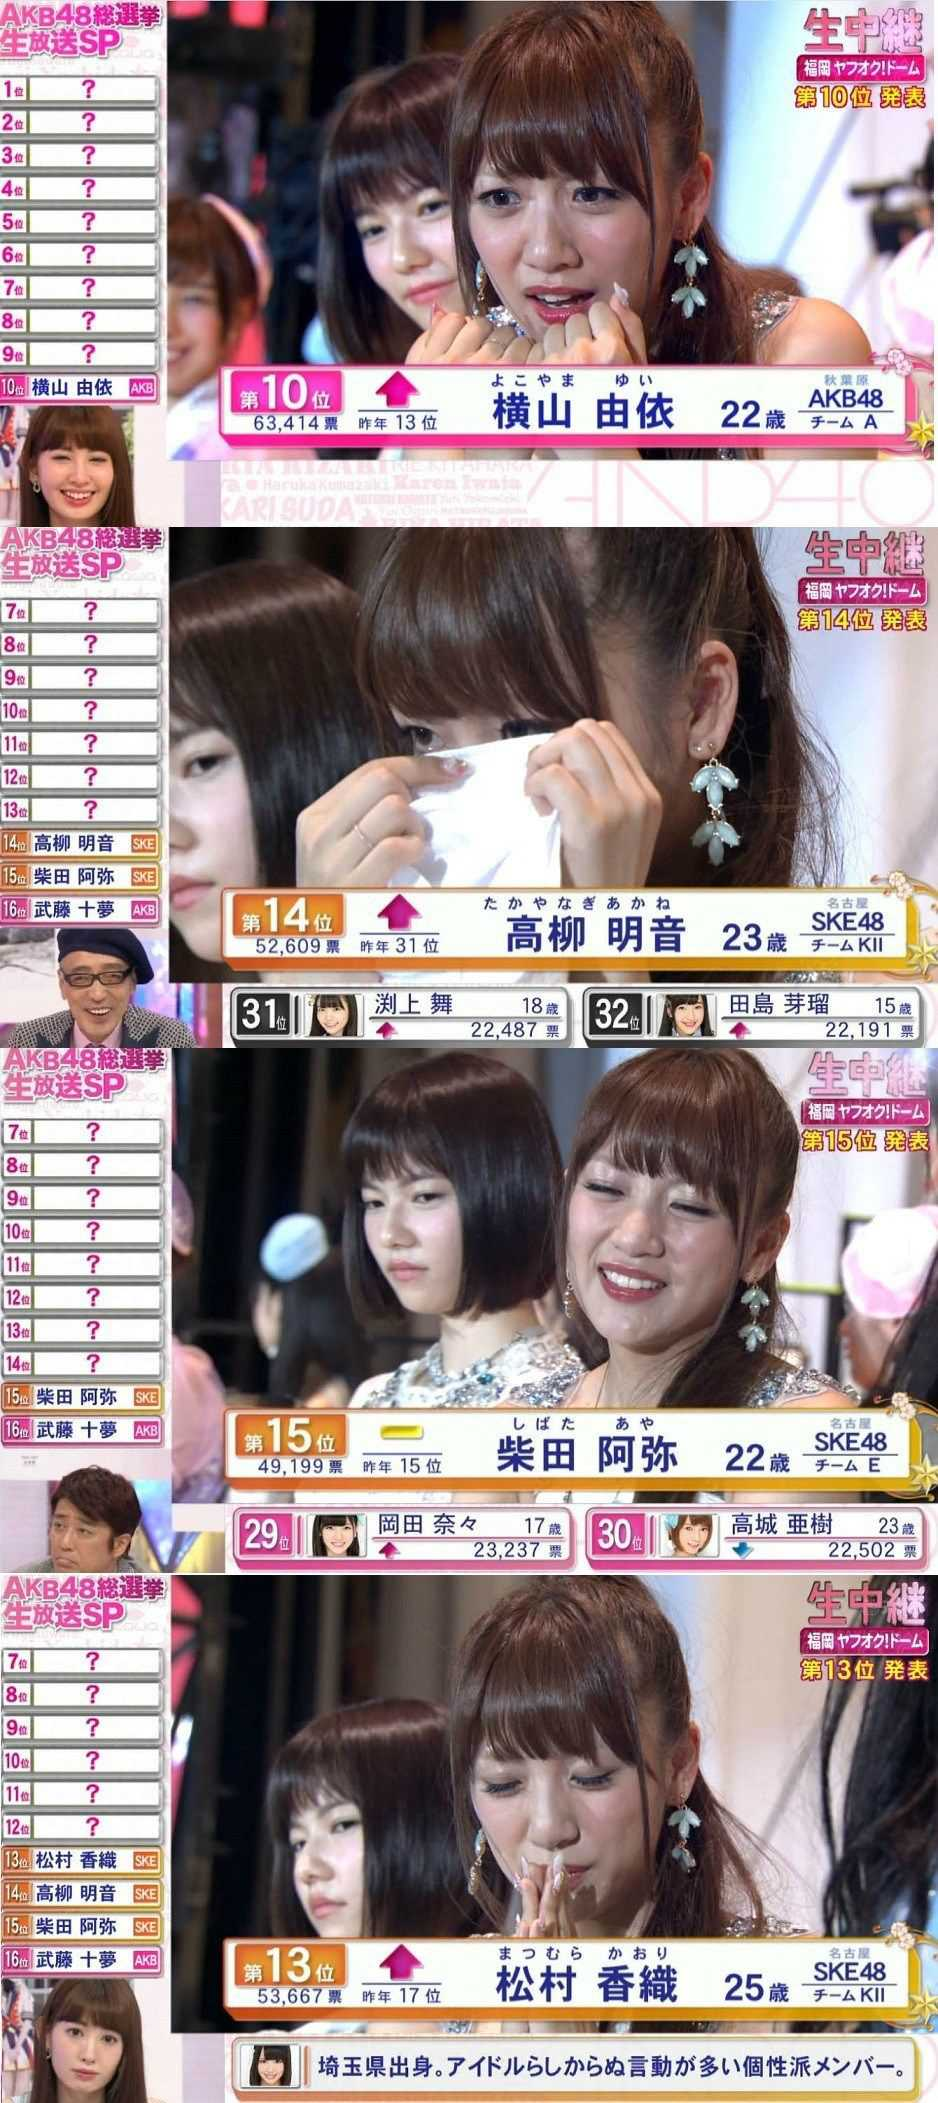 takahashi minami election